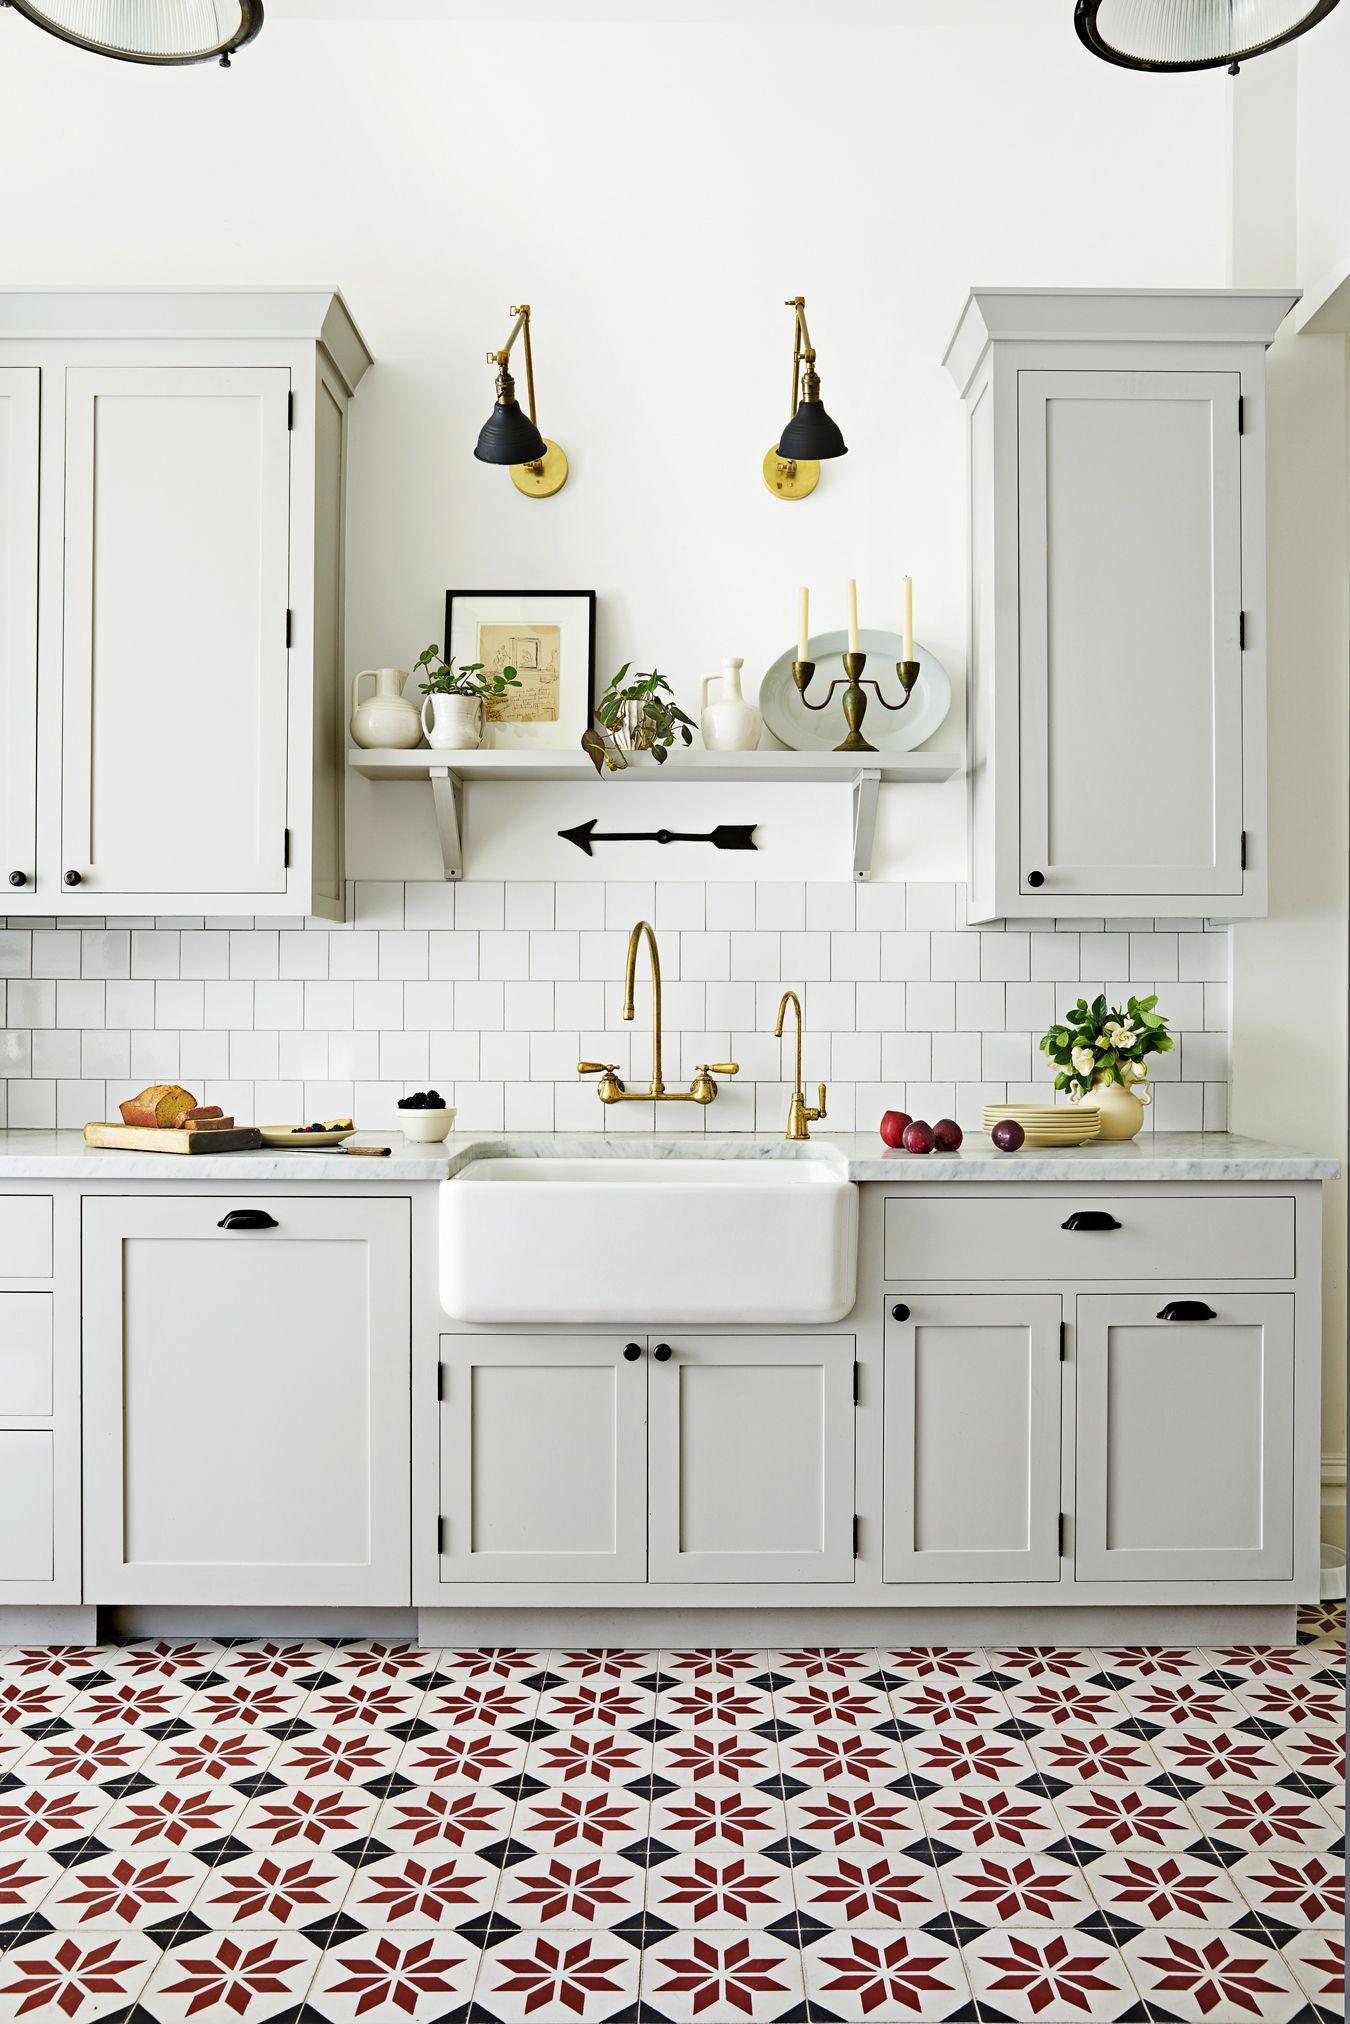 We Predict These Kitchen Trends Will Be Everywhere In 2021 Kitchen Design Trends White Kitchen Design White Kitchen Floor